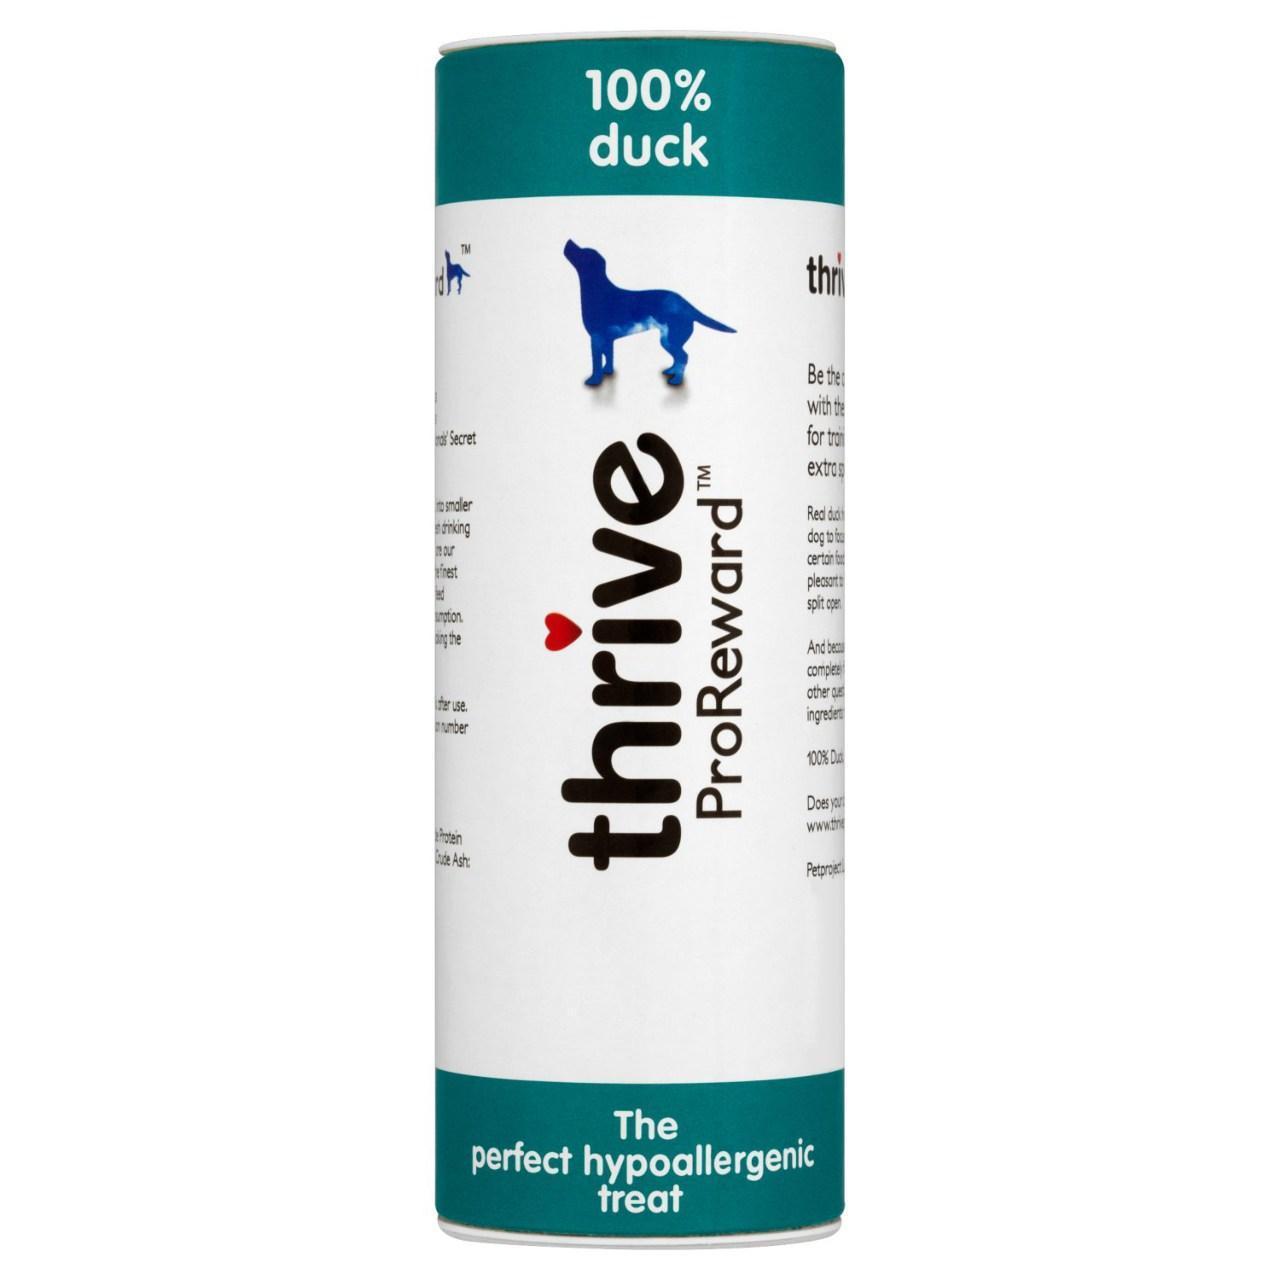 An image of Thrive ProReward 100% Duck Dog Treats